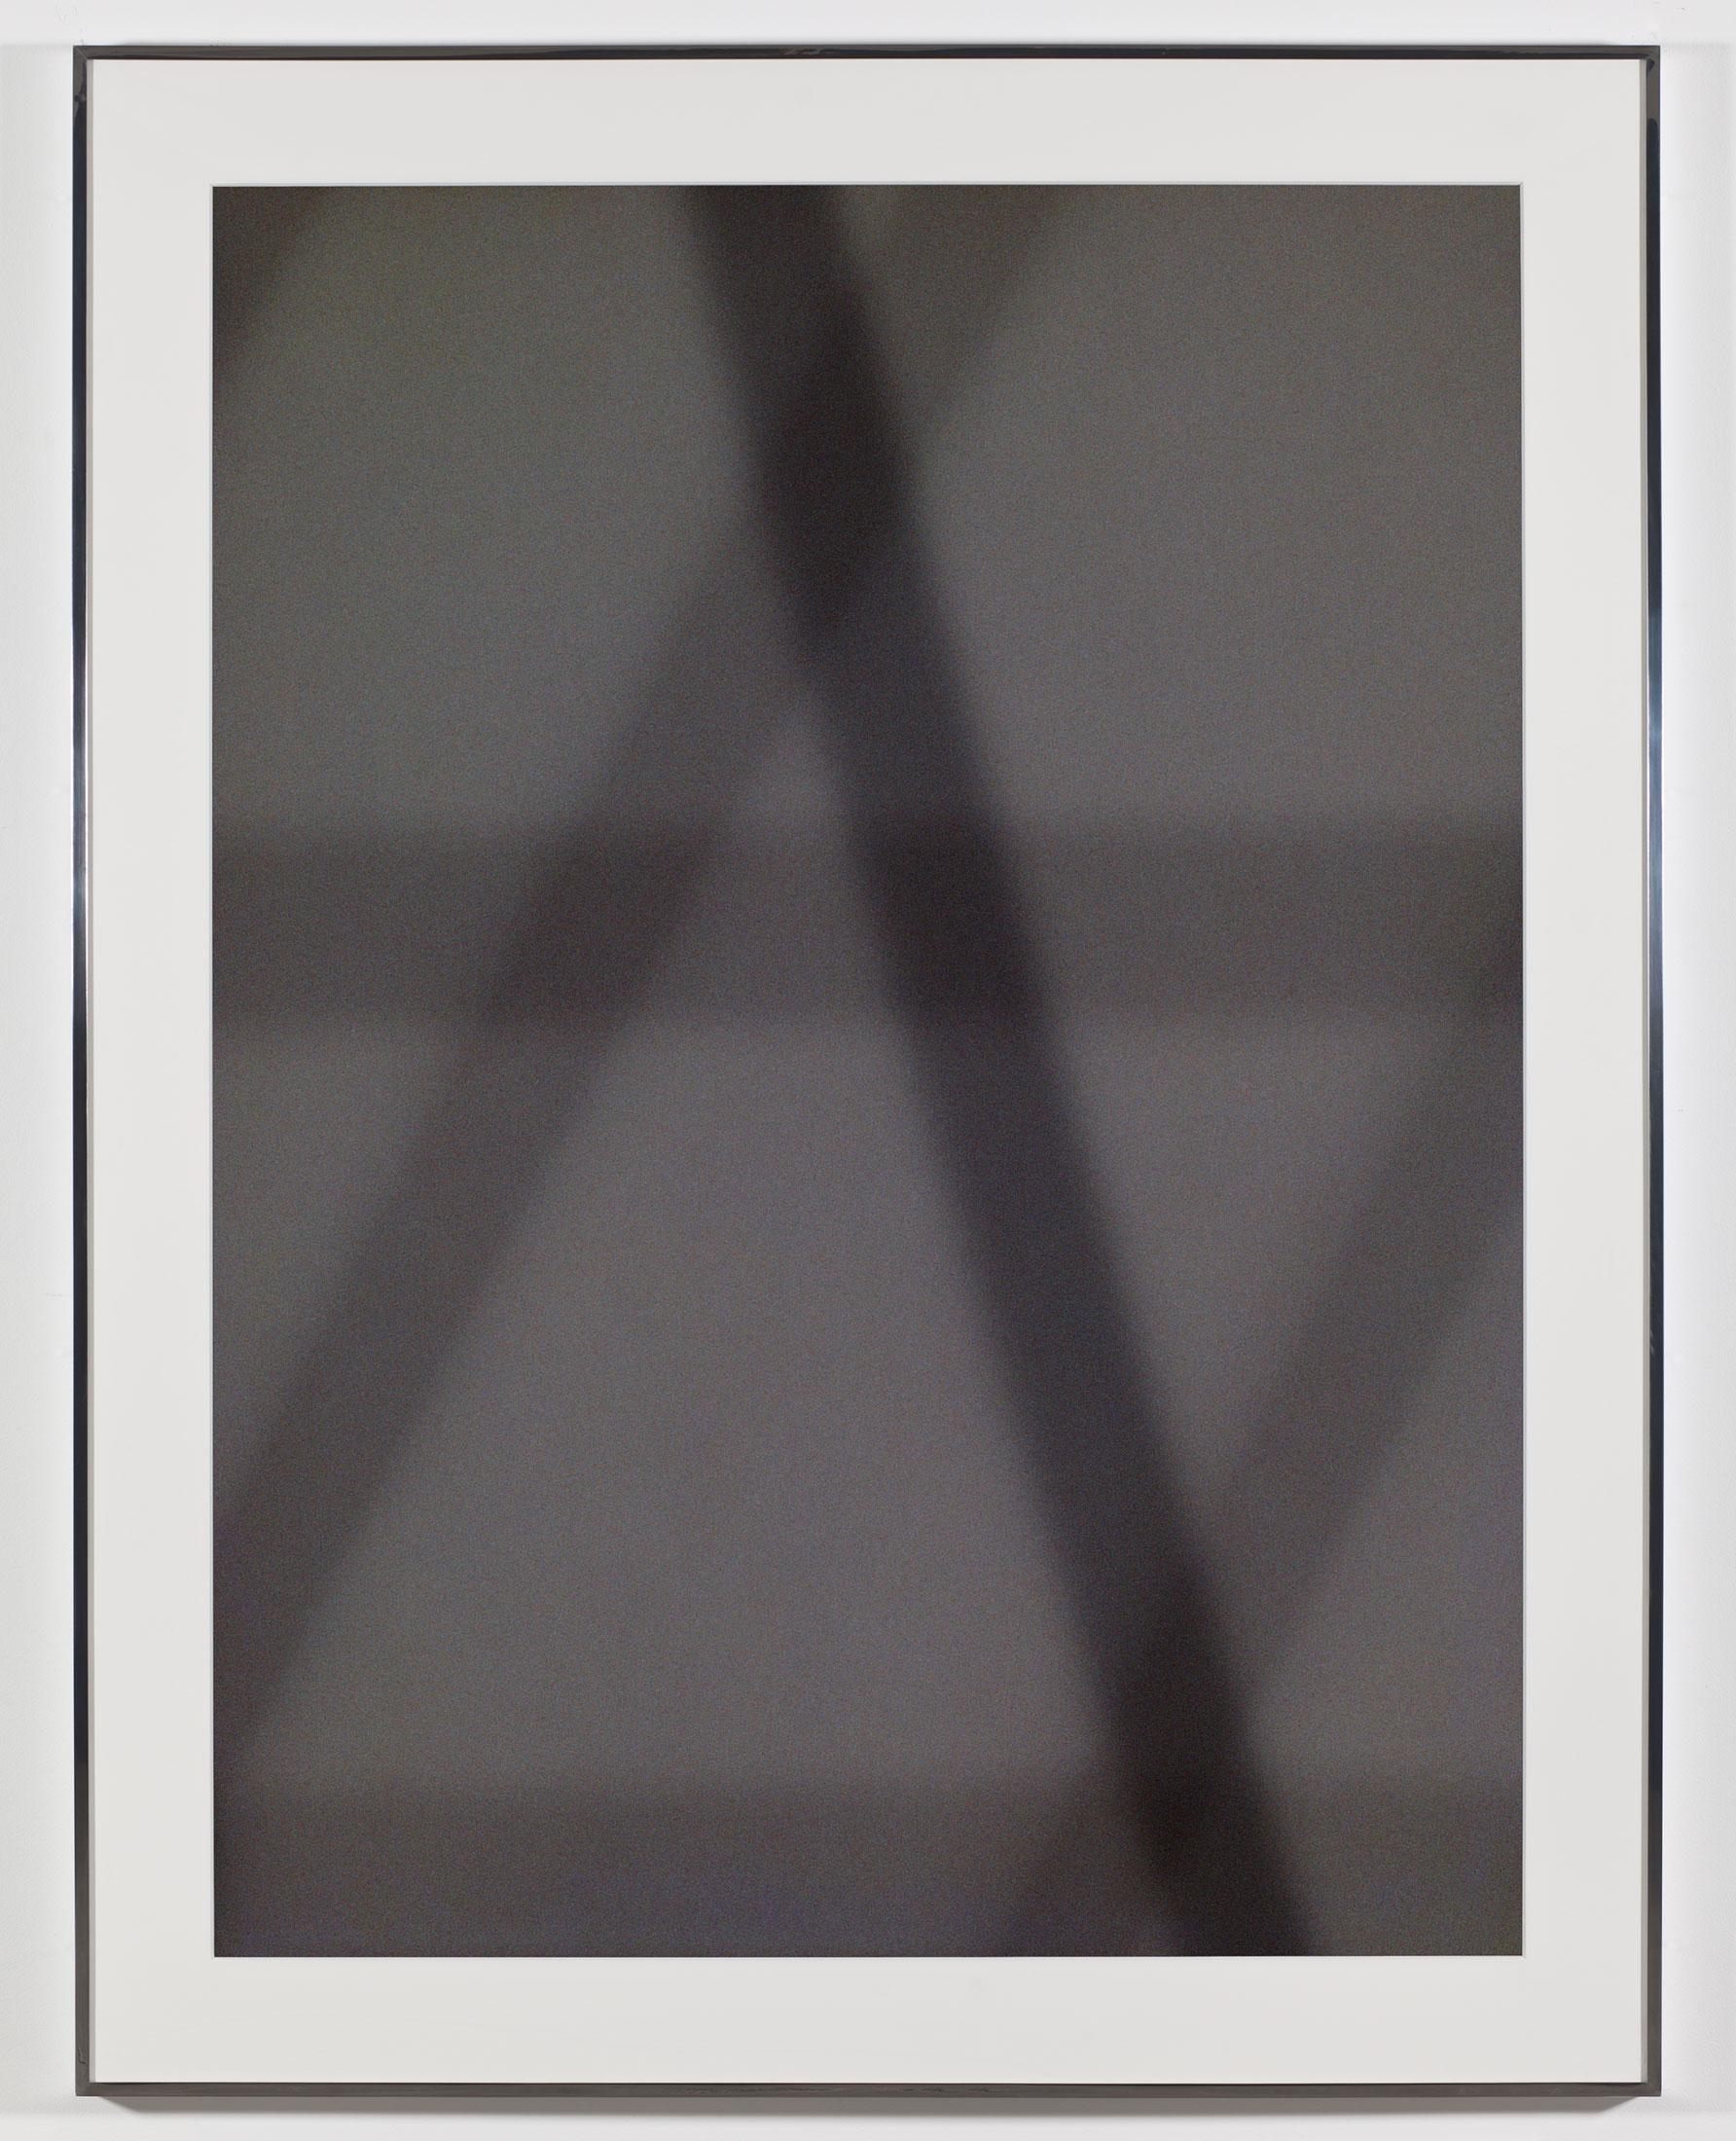 Transparency (Positive) [Fujichrome RDPIII Provia 100F Em. No. 05182: July 3–7, 2010 LAX/IAD/FRA/BLQ BLQ/BRU/ORD/LAX]    2011   Epson Ultrachrome K3 archival ink jet print on Museo Silver Rag Paper  68 x 52 1/4 inches   Transparencies, 2008–2014